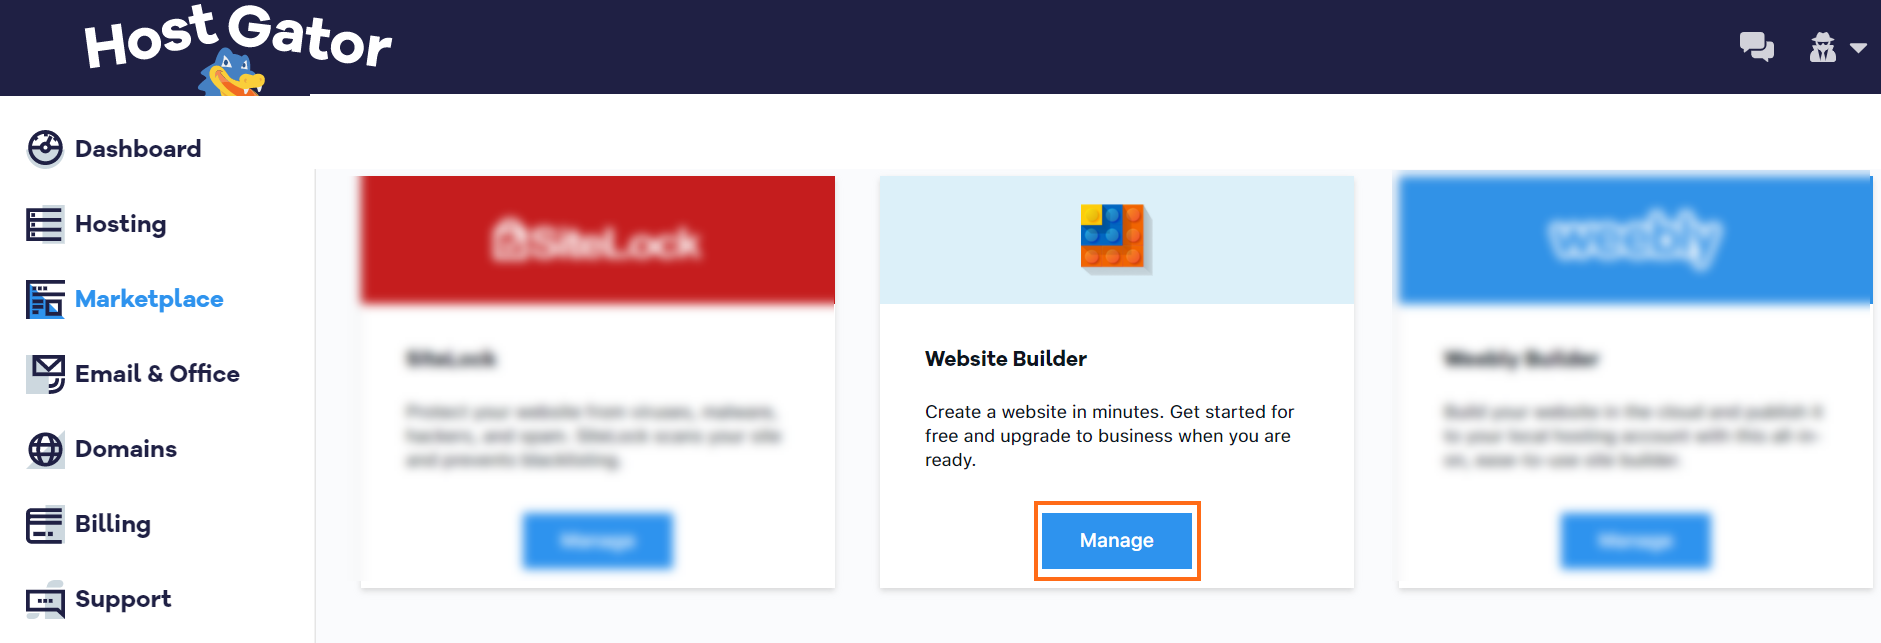 Website Builder - Desktop Editing   HostGator Support